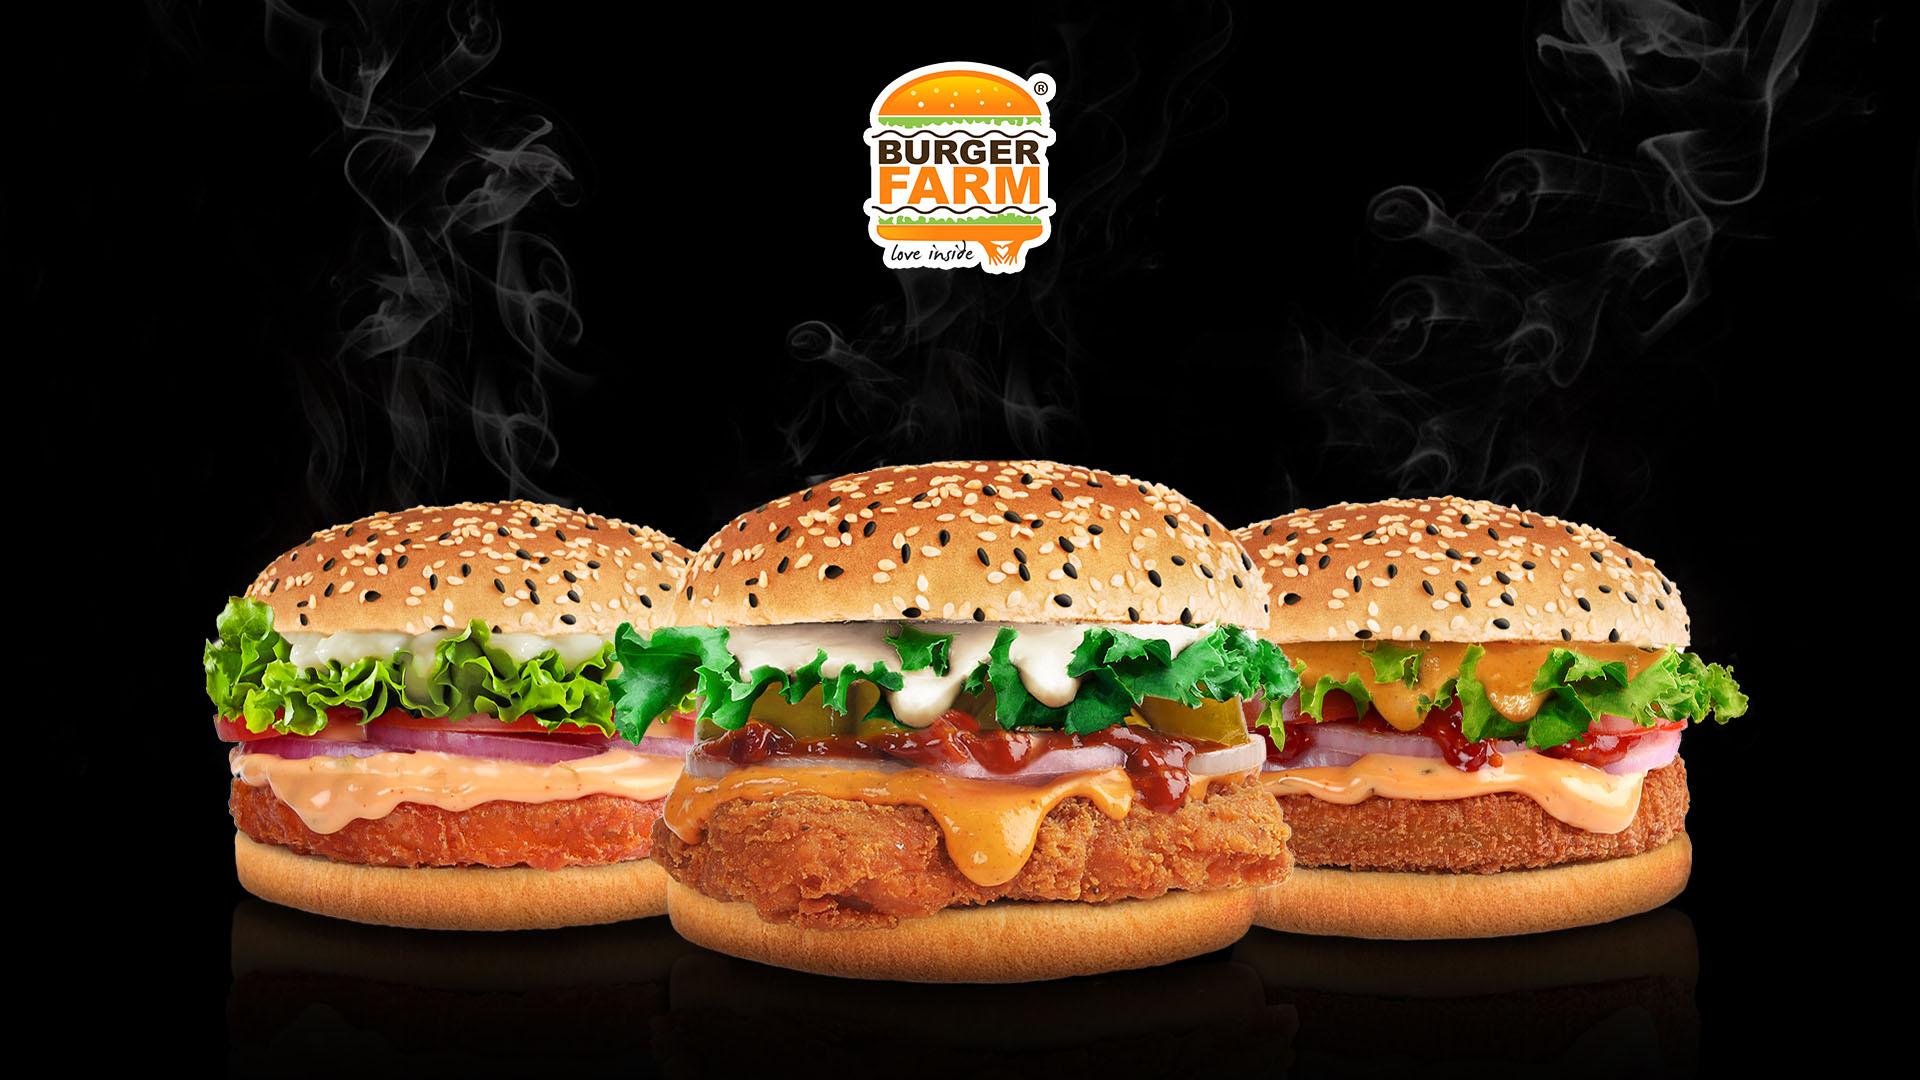 burgerfarm 5